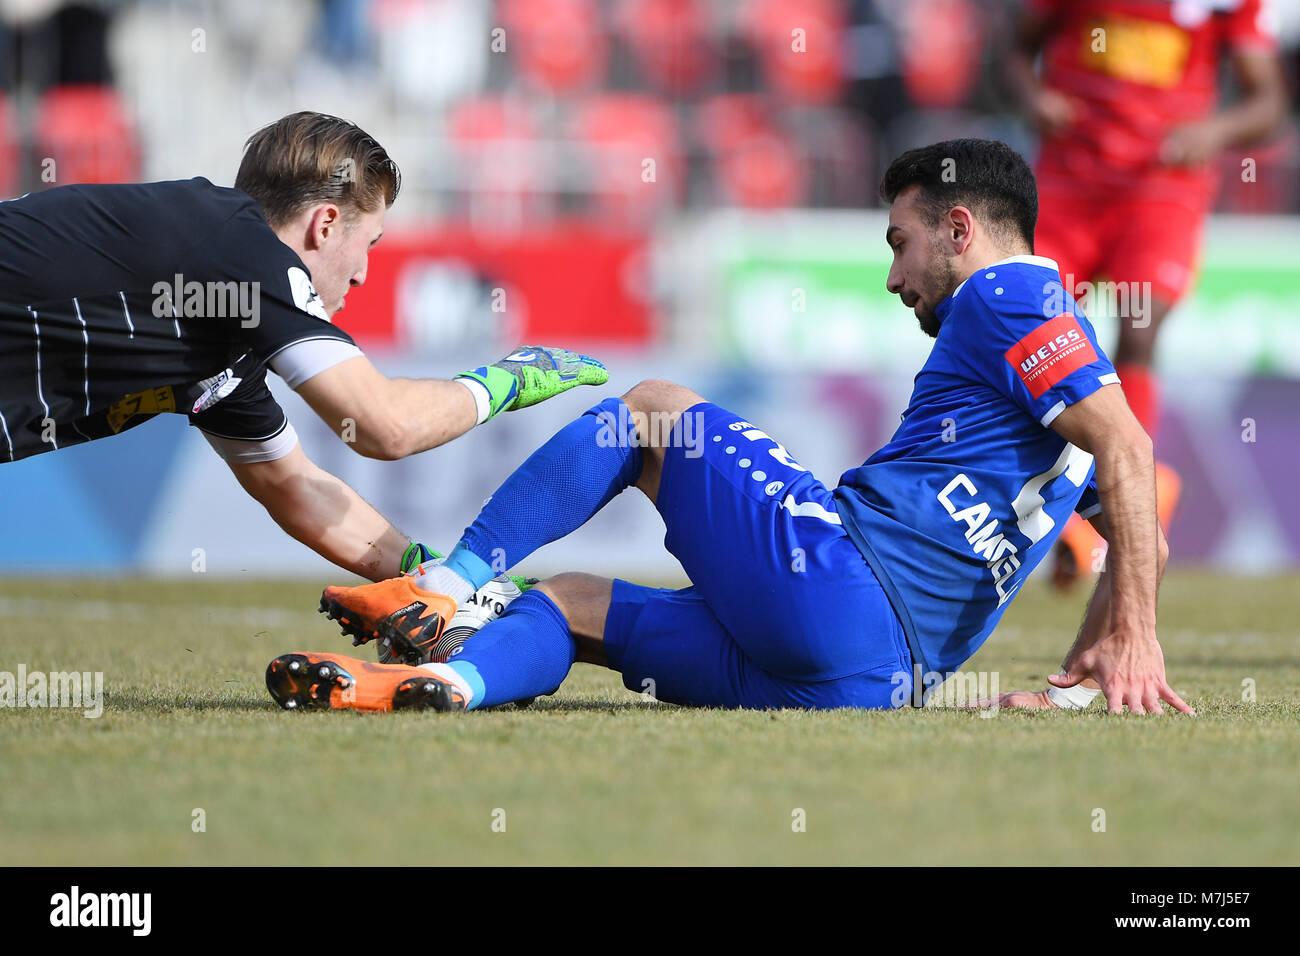 Burak Camoglu (KSC, r.) im Duell with goalwart Philipp Klewin (RW, l.).  GES/ Fussball/ 3. Liga: RW Erfurt - Karlsruher - Stock Image